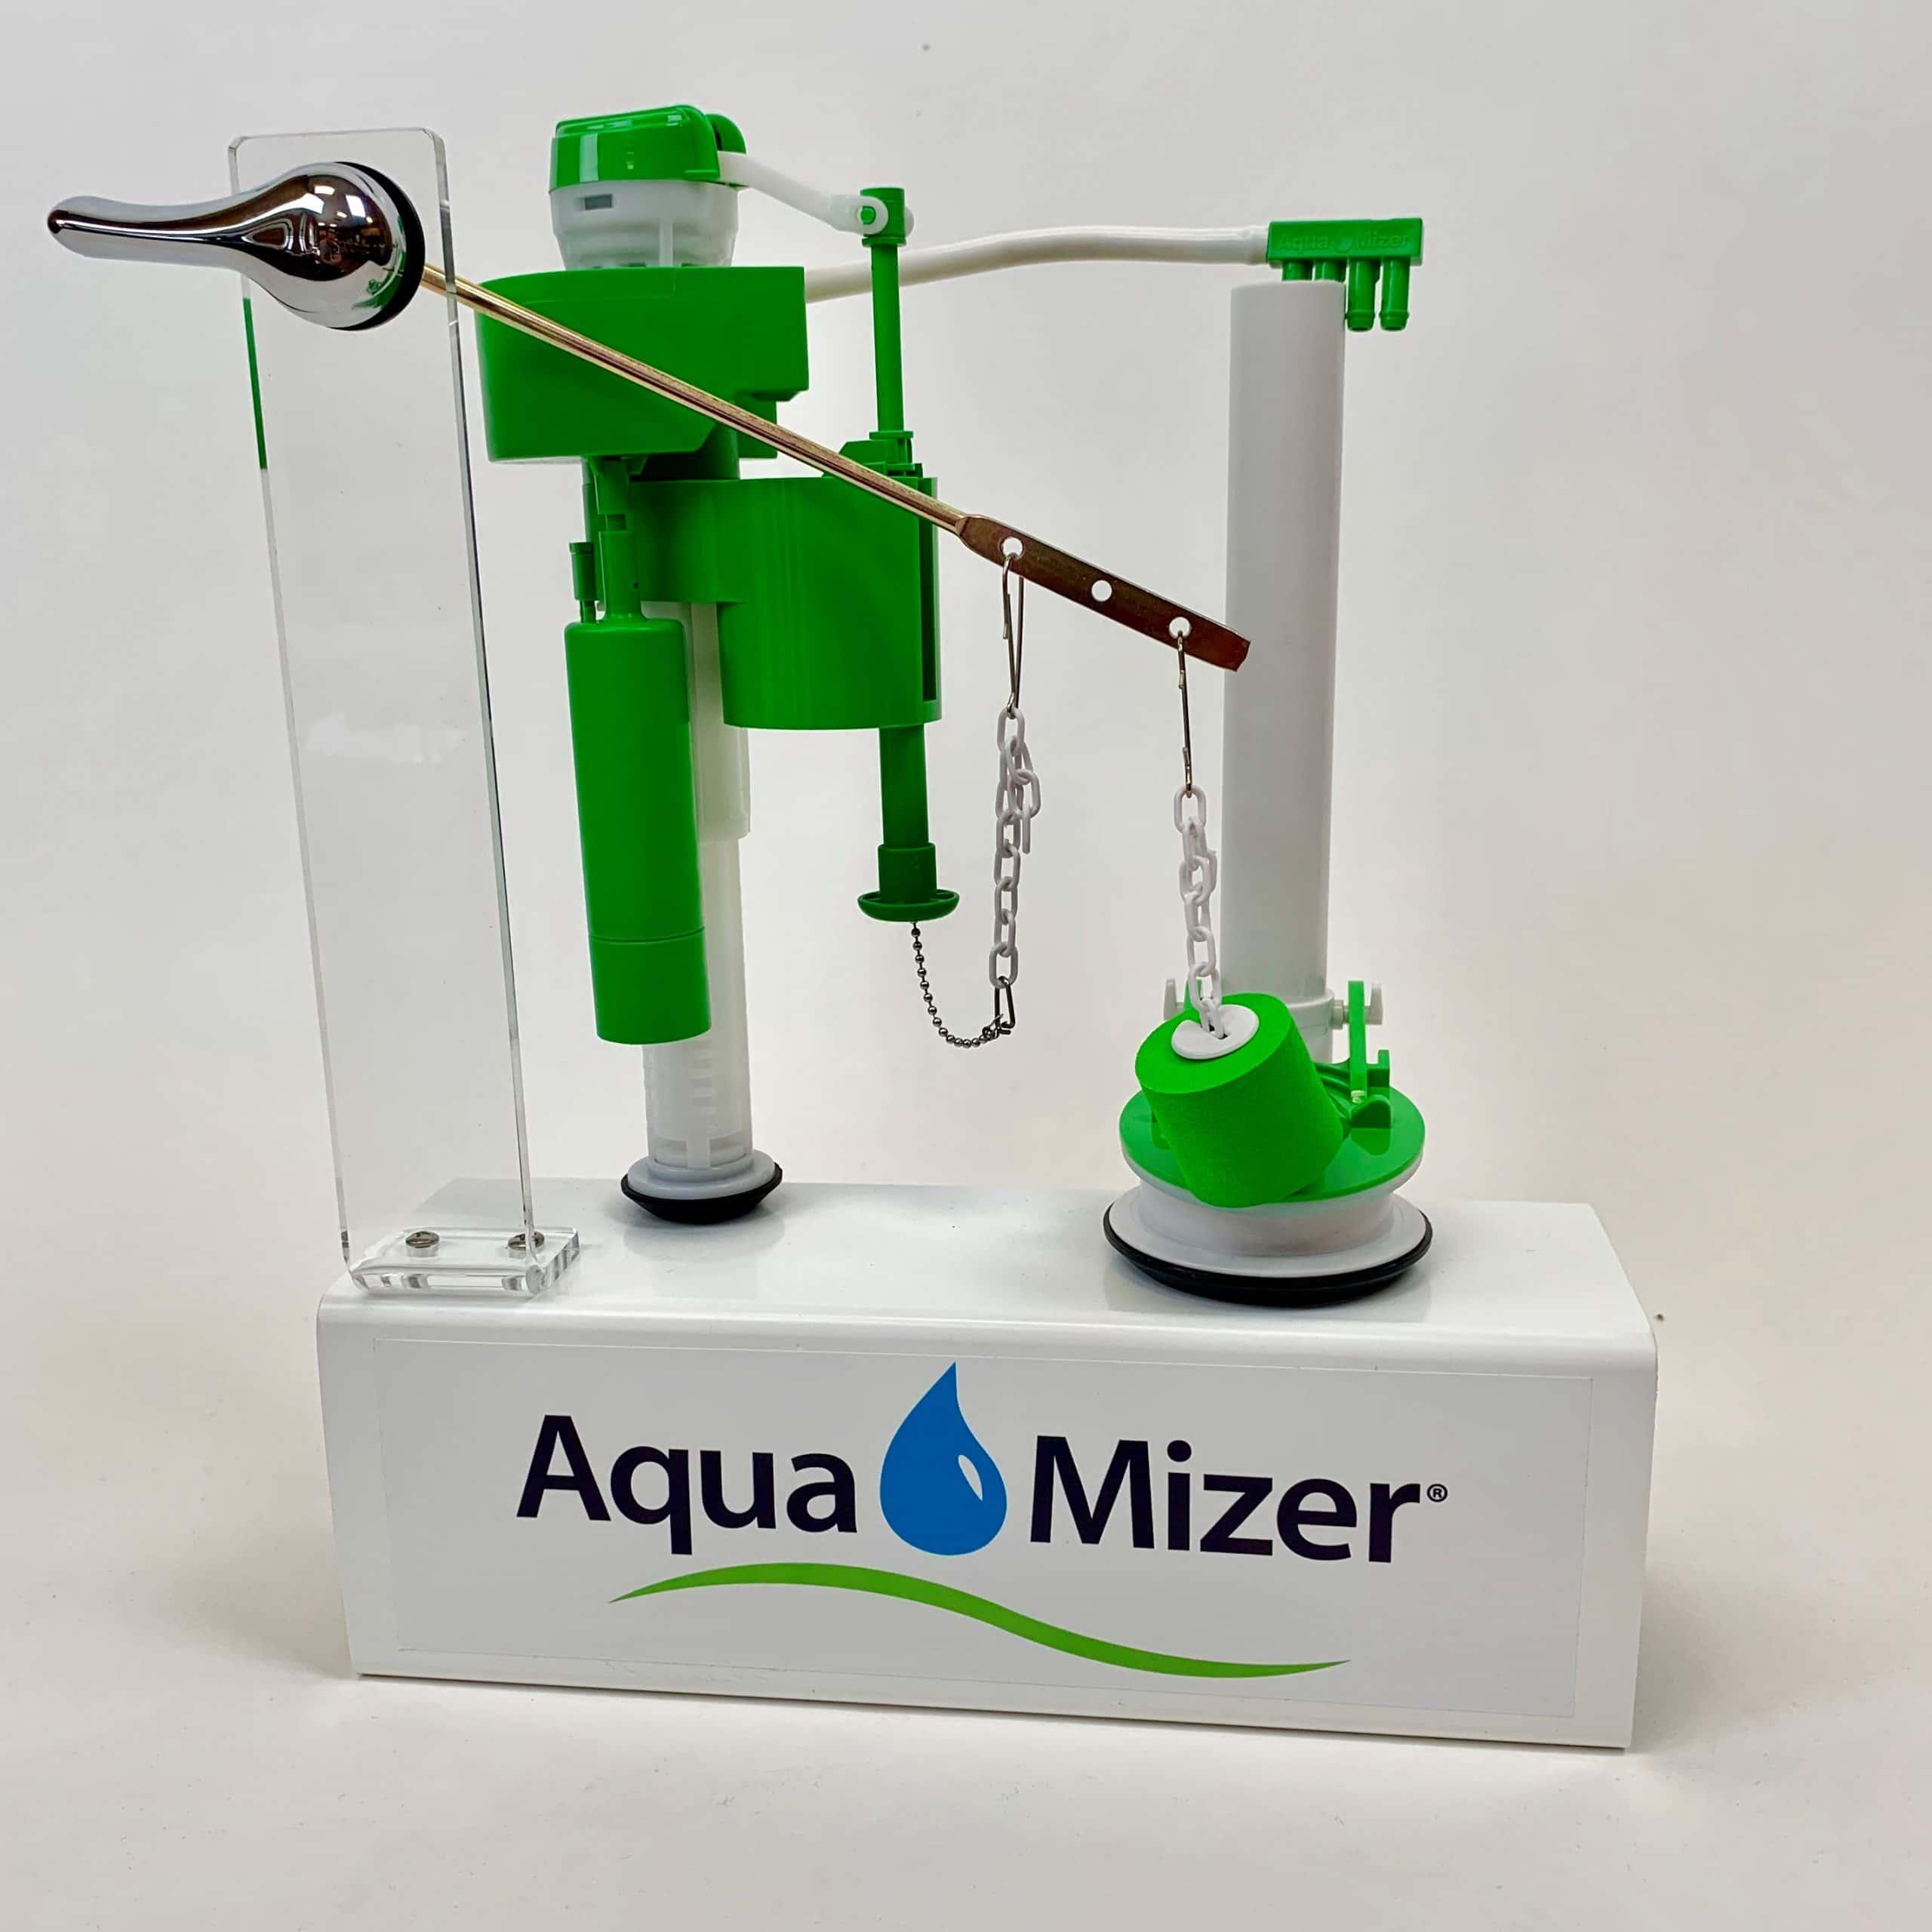 The Aqua Mizer Solution